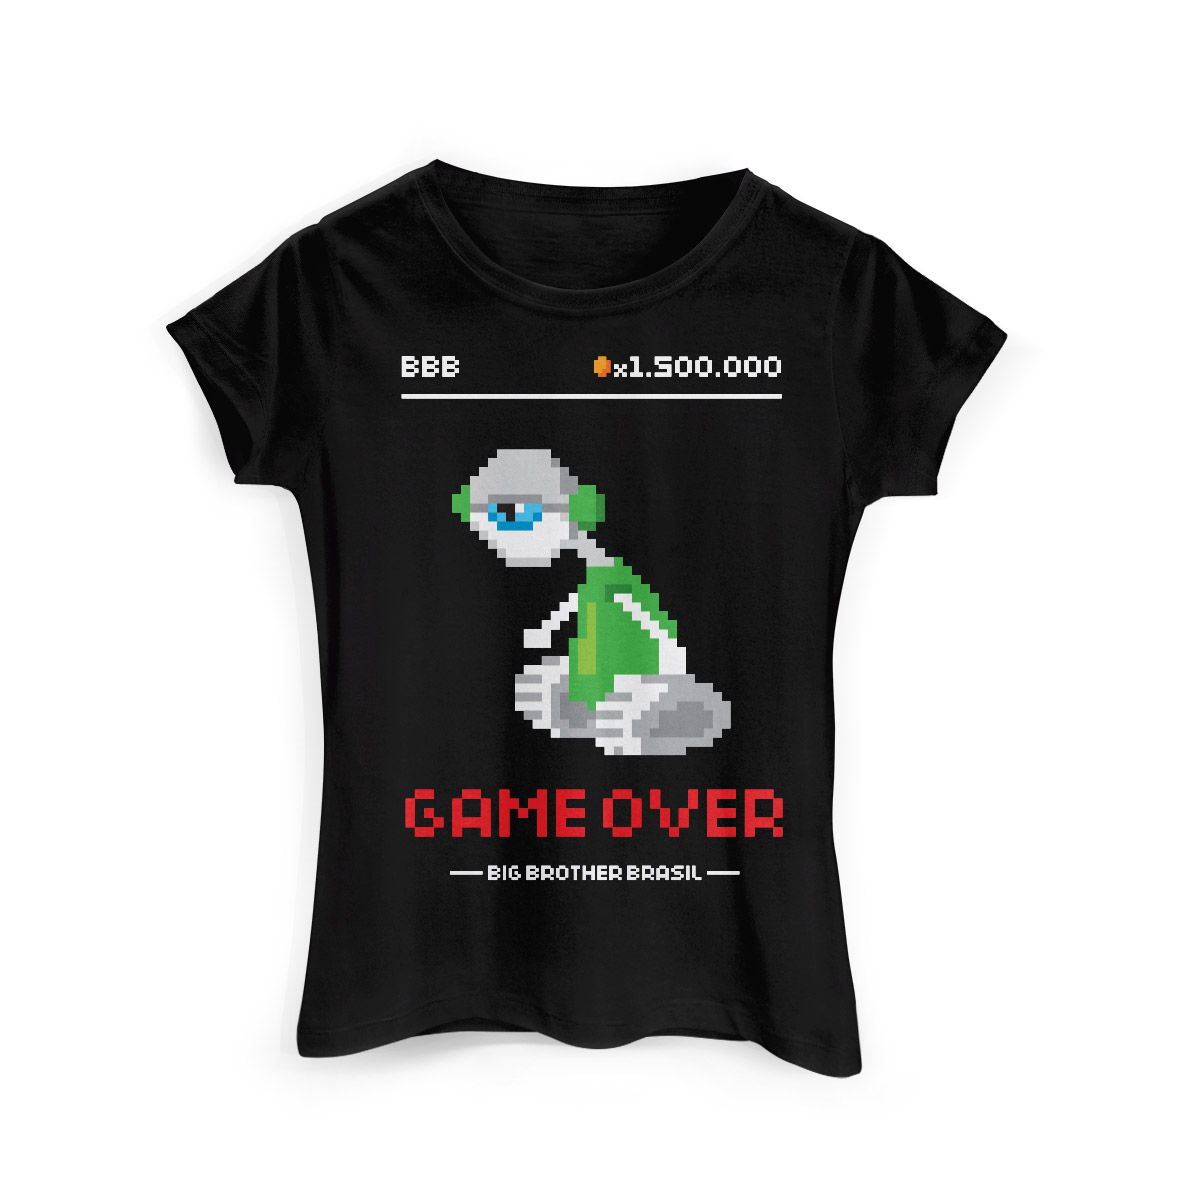 Camiseta Feminina Big Brother Brasil 15 Game Over